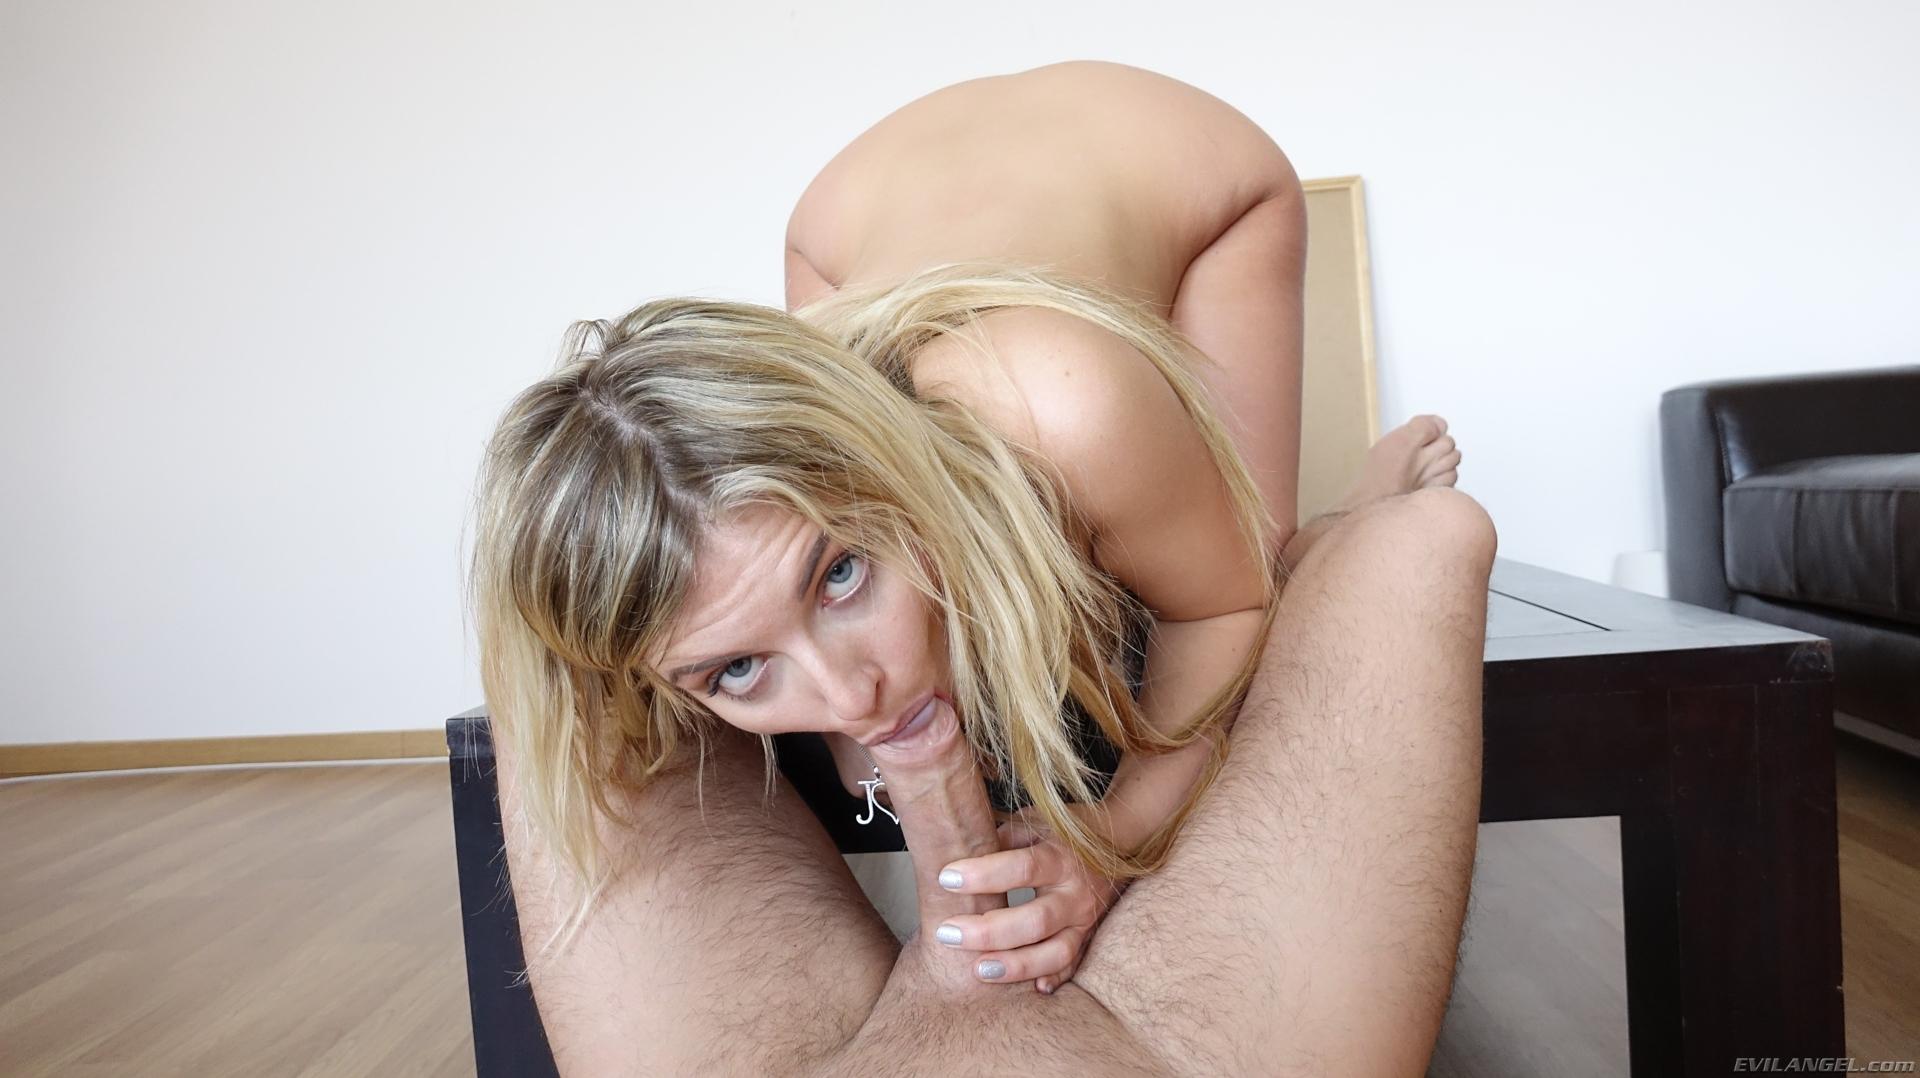 Jemma Valentine - el arte del placer anal